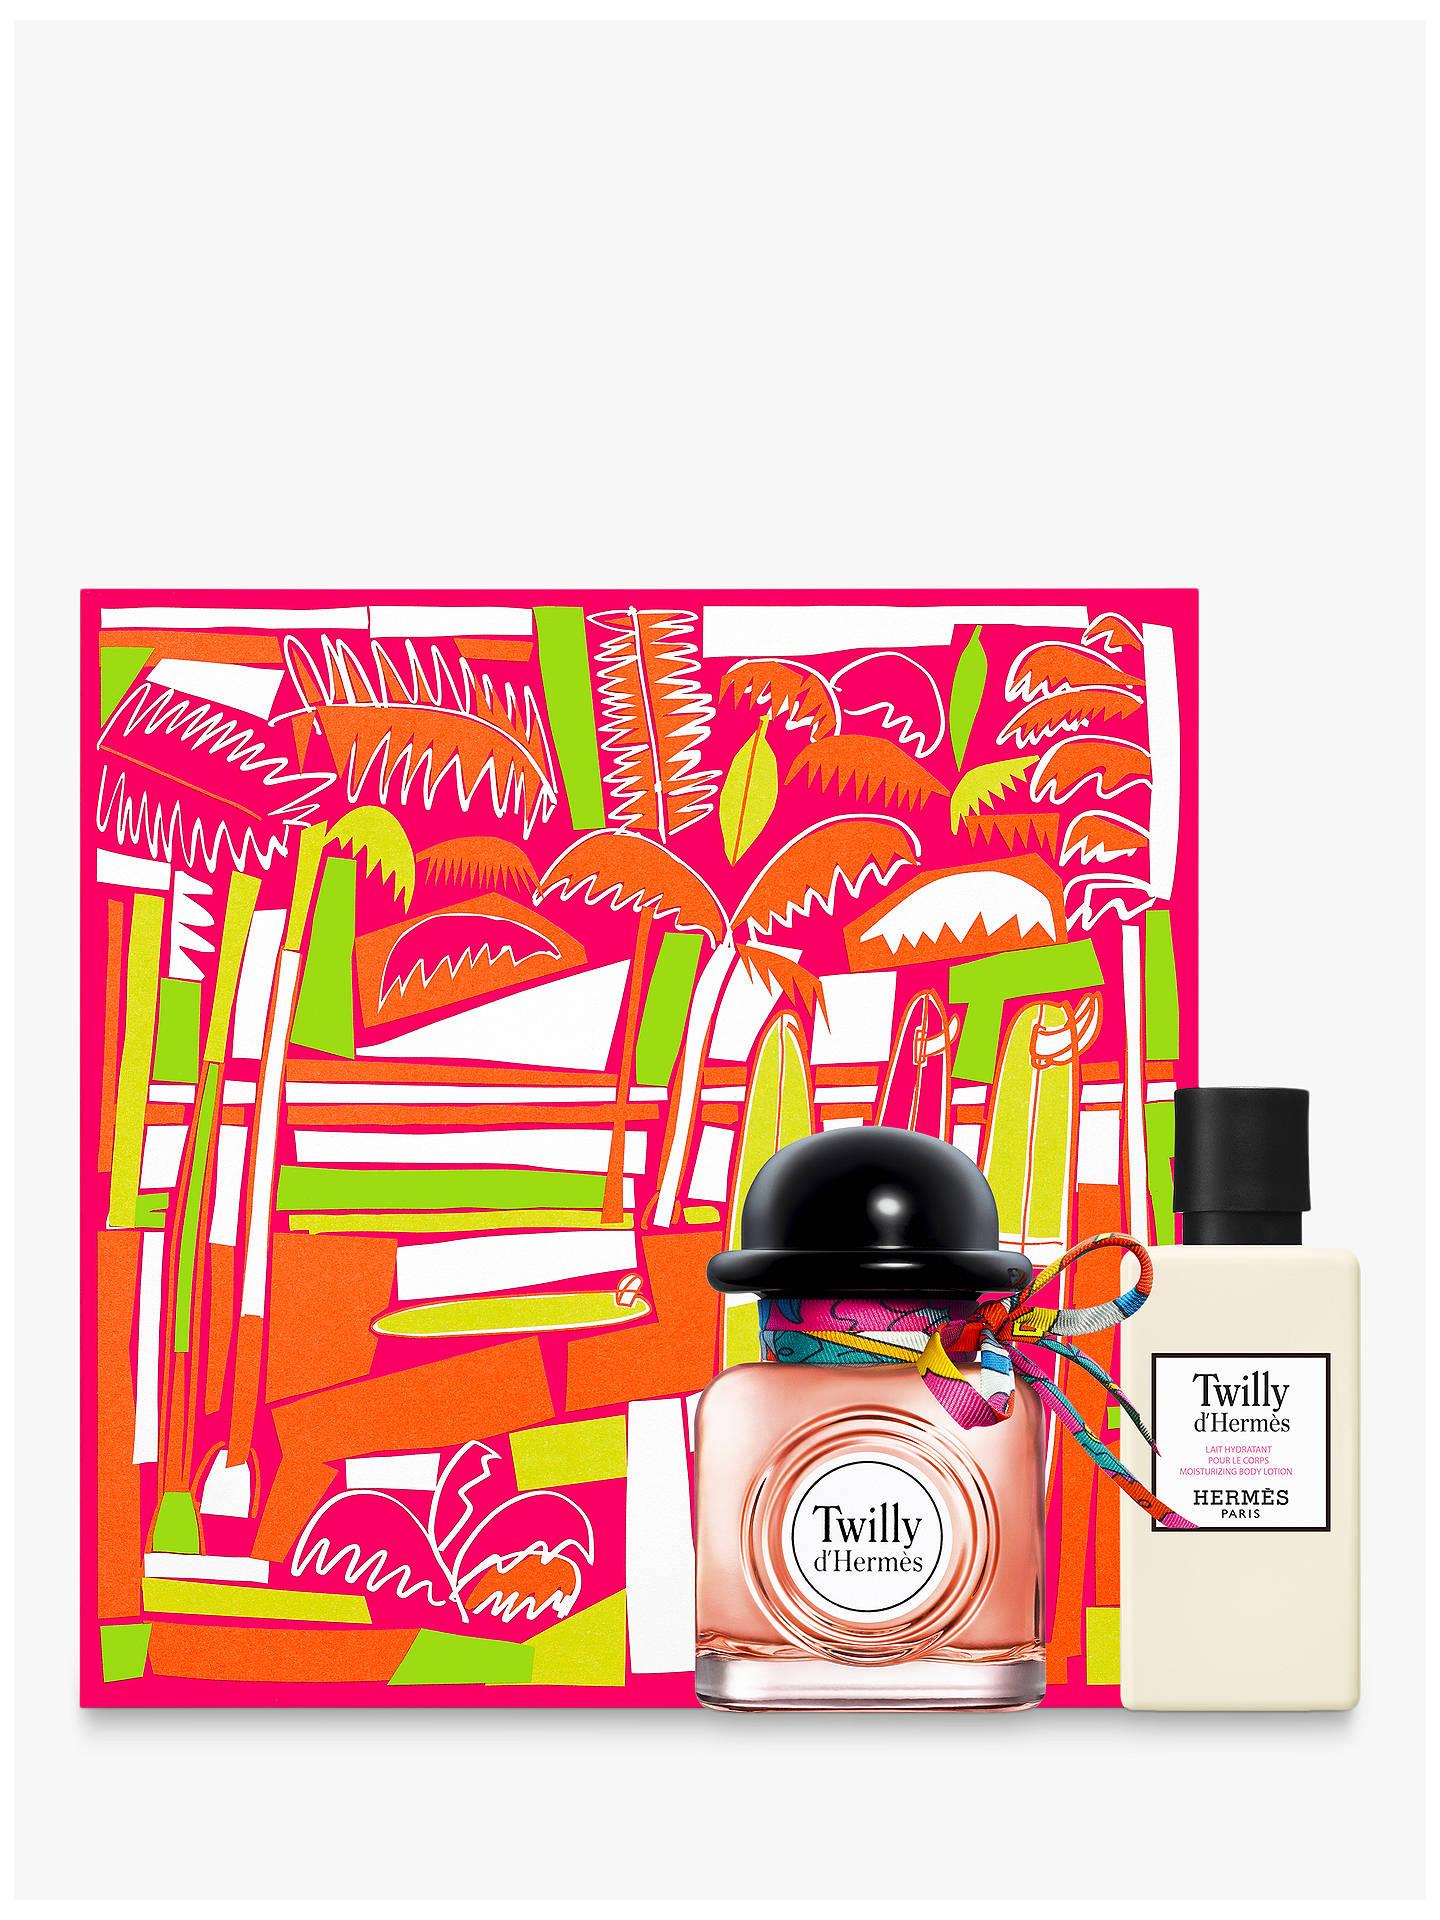 Hermès Twilly Dhermès Eau De Parfum 50ml Fragrance Gift Set At John